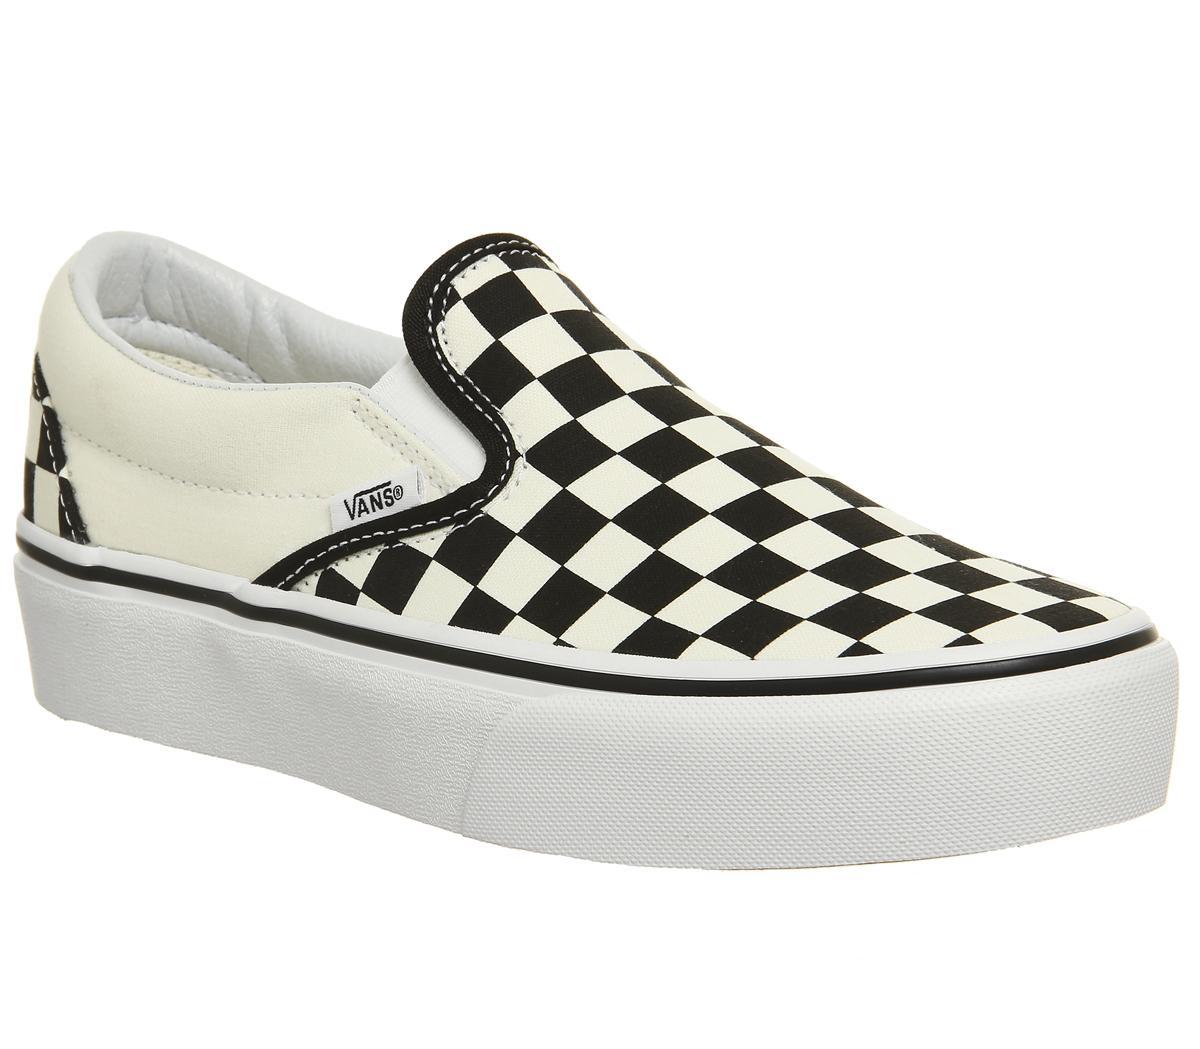 3cd275ebe8c Vans Classic Slip On Platform Trainers Black White Checker - Hers ...